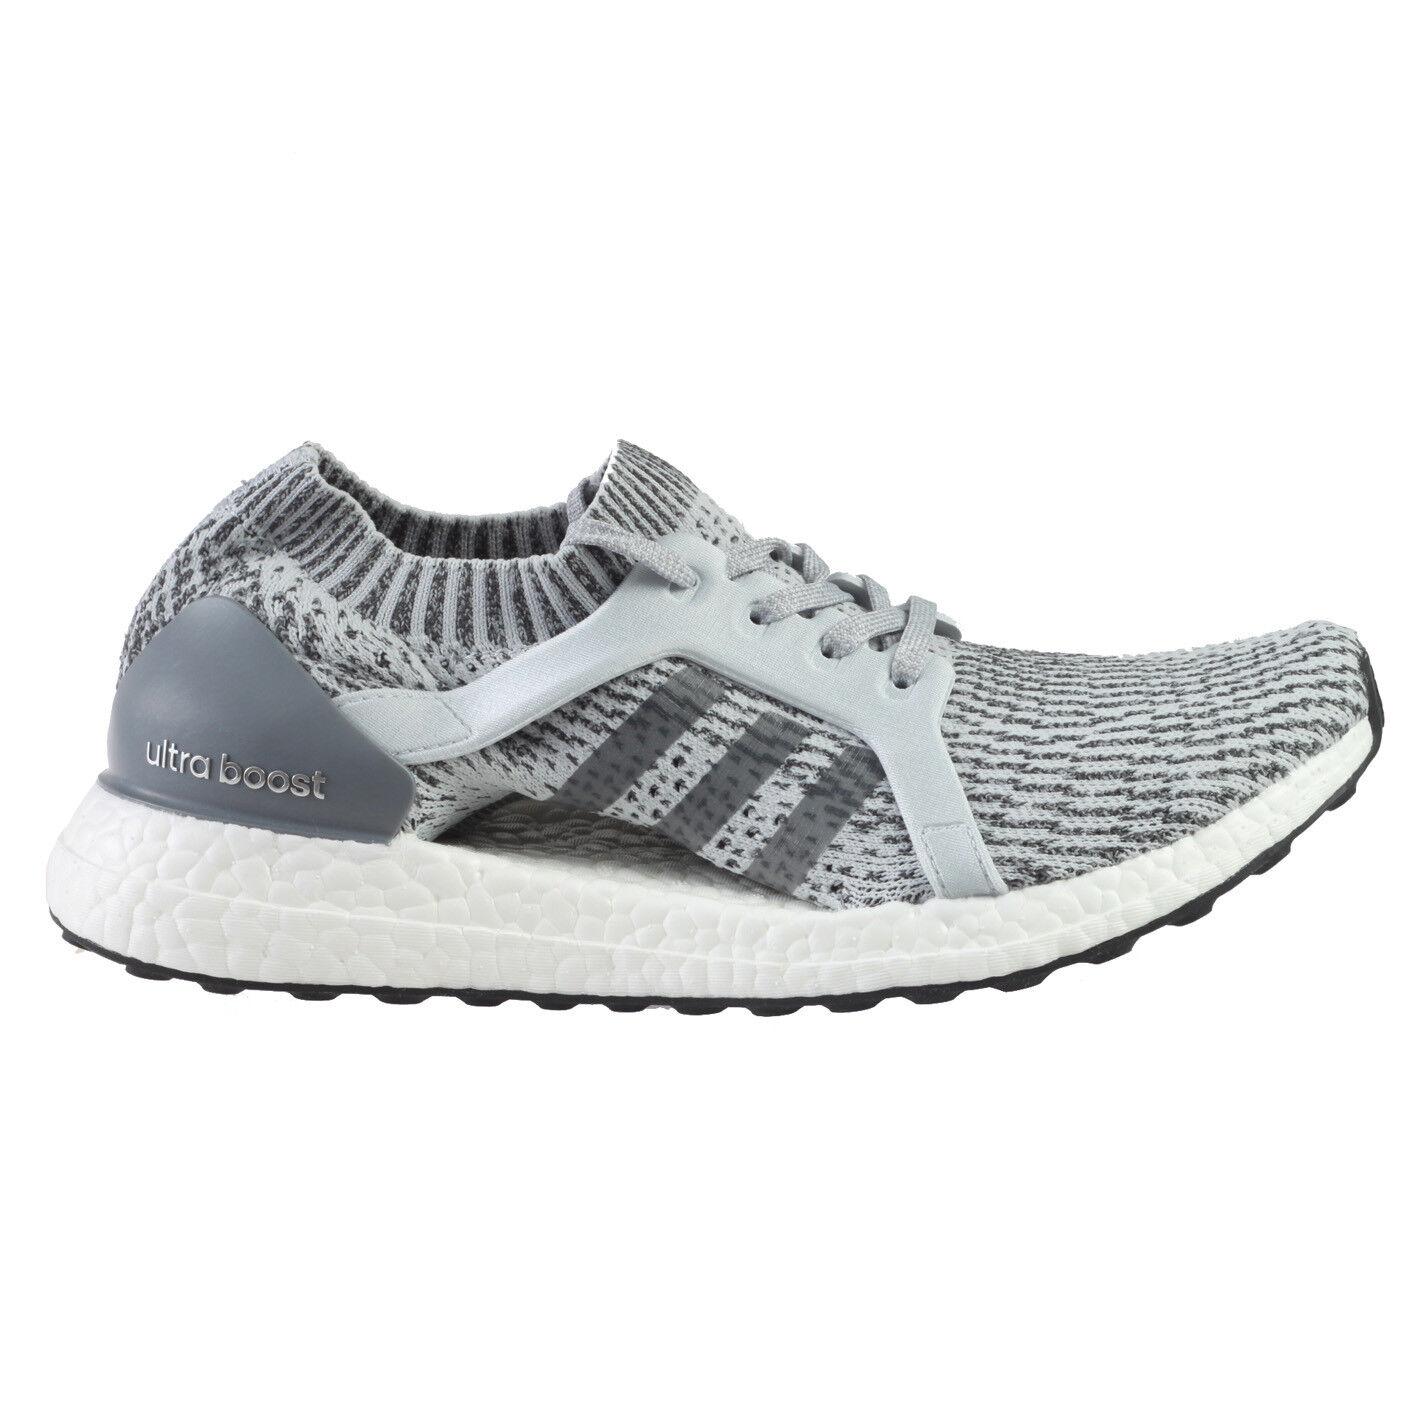 Adidas ultra impulso x primeknit donne bb1695 chiaro grigio primeknit x scarpe taglia 9,5 7210c6